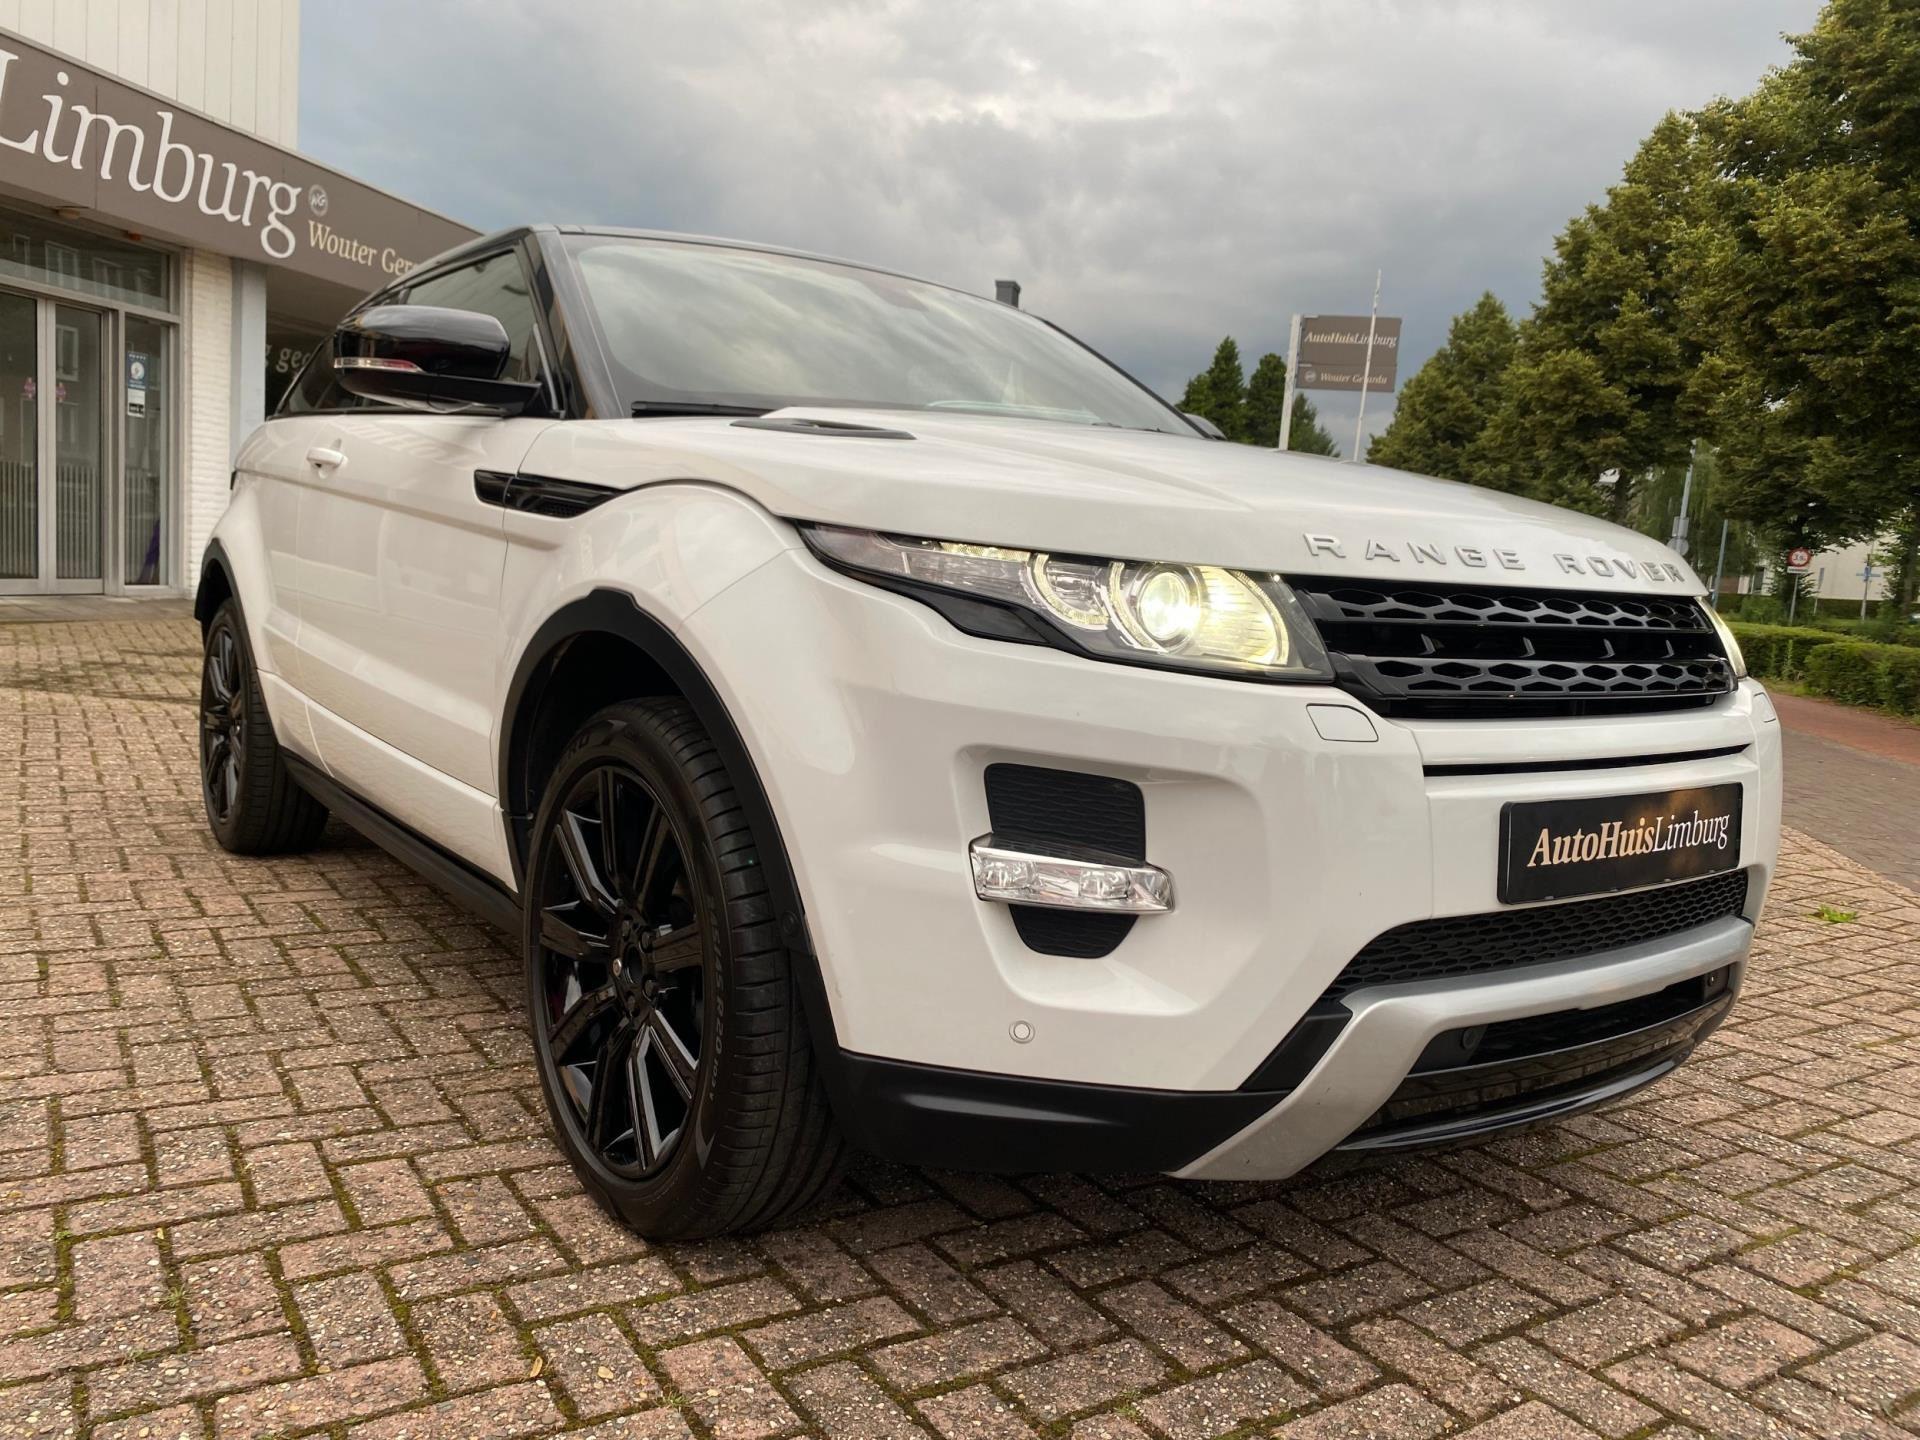 Land Rover Range Rover Evoque Coupé occasion - AutoHuisLimburg